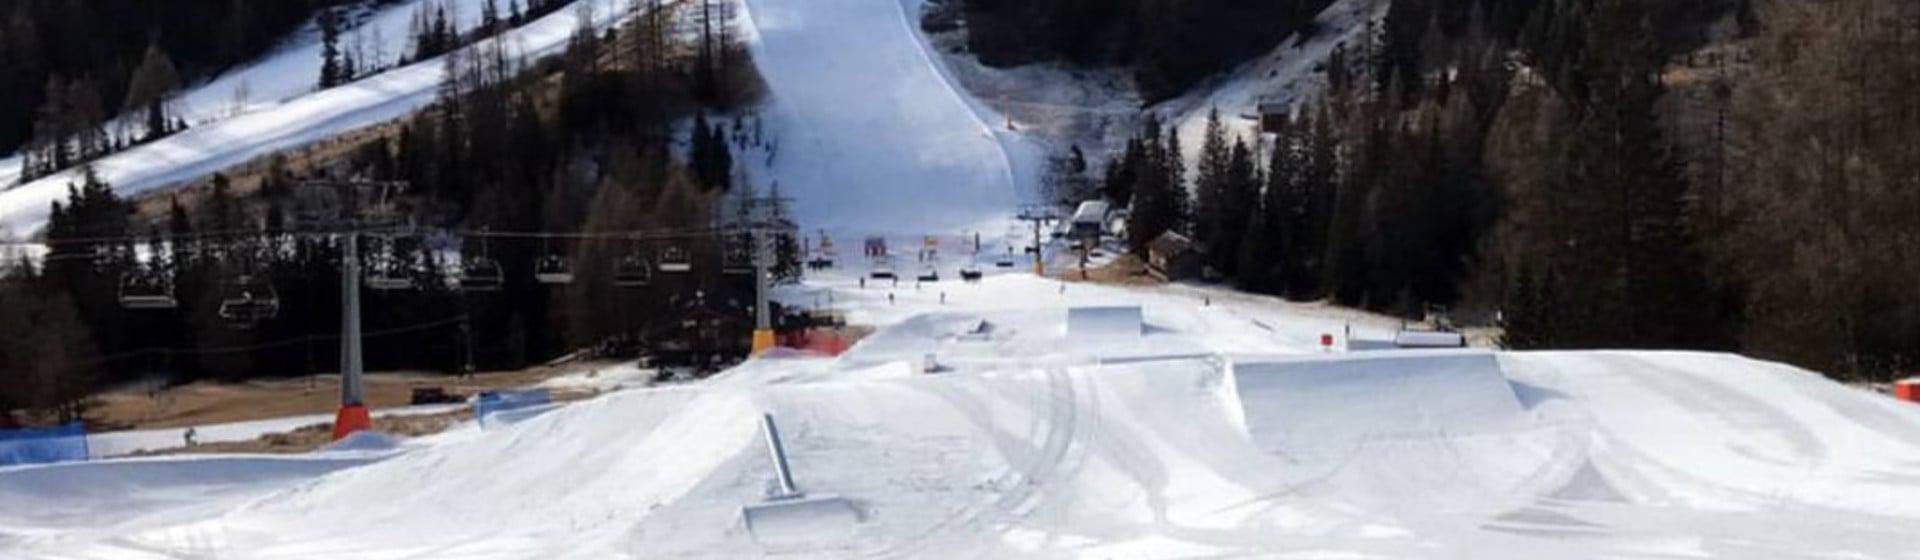 SNOWPARK: Arabba SuperPark ist geöffnet.